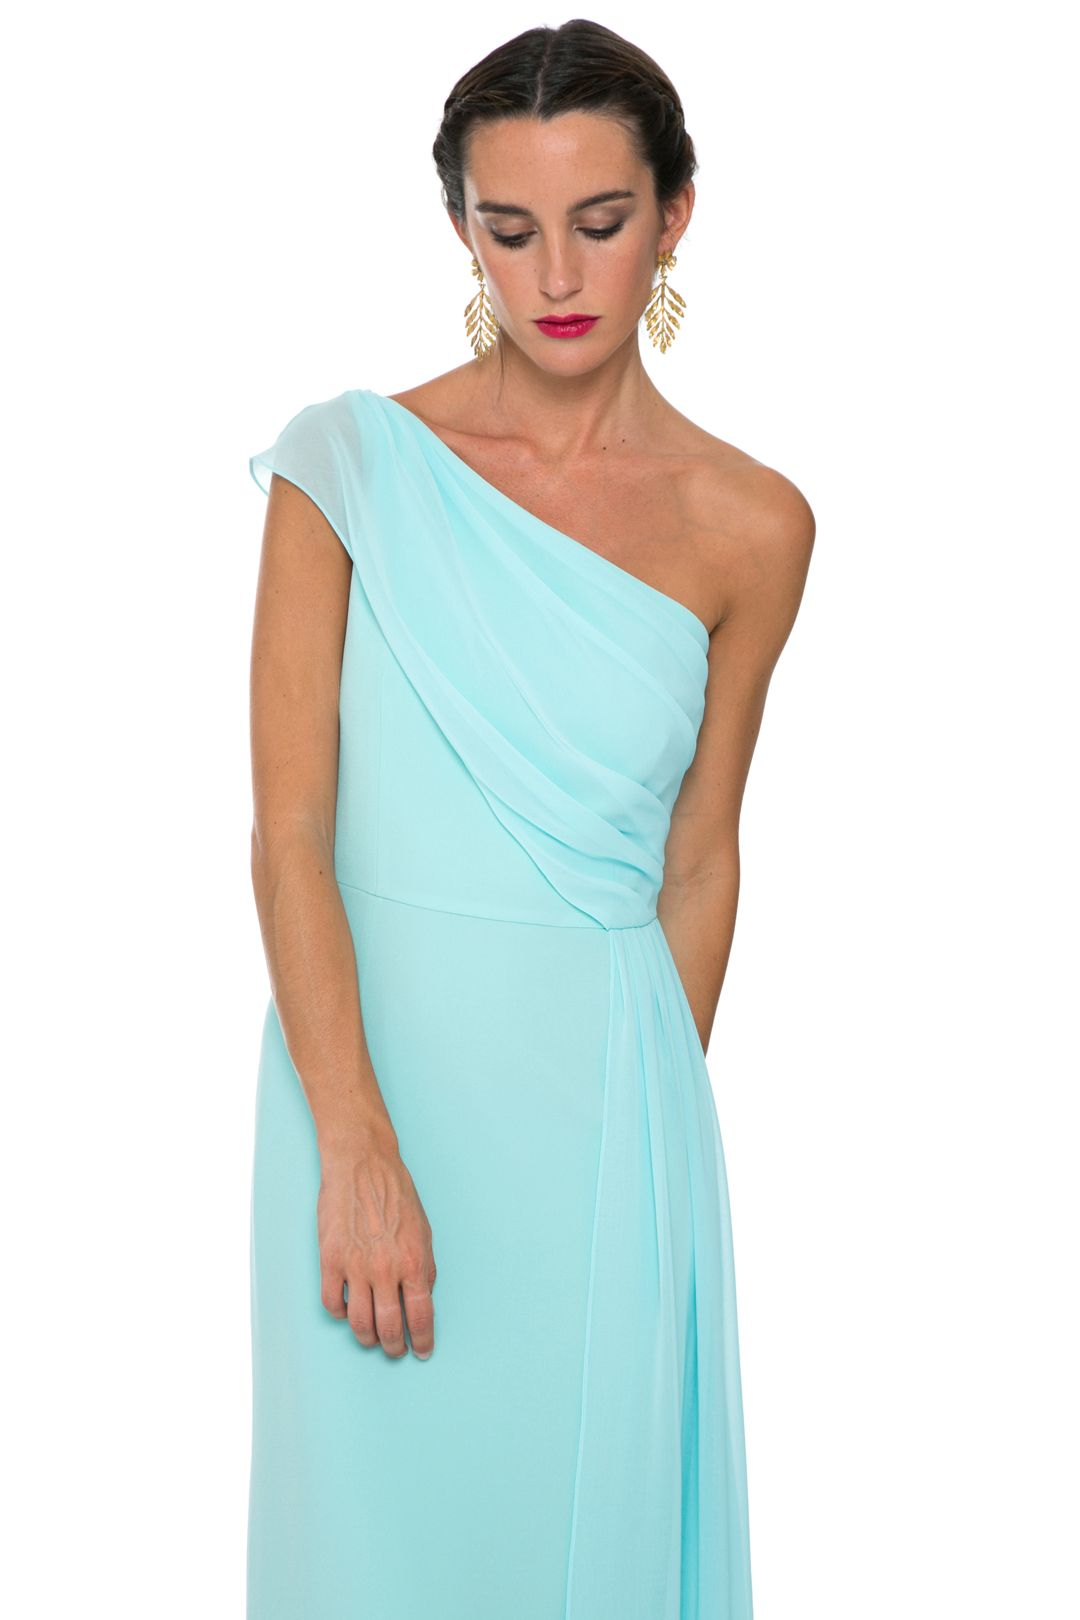 Vestido Mint Goddess | Vestidos | Pinterest | Alquiler de vestidos ...